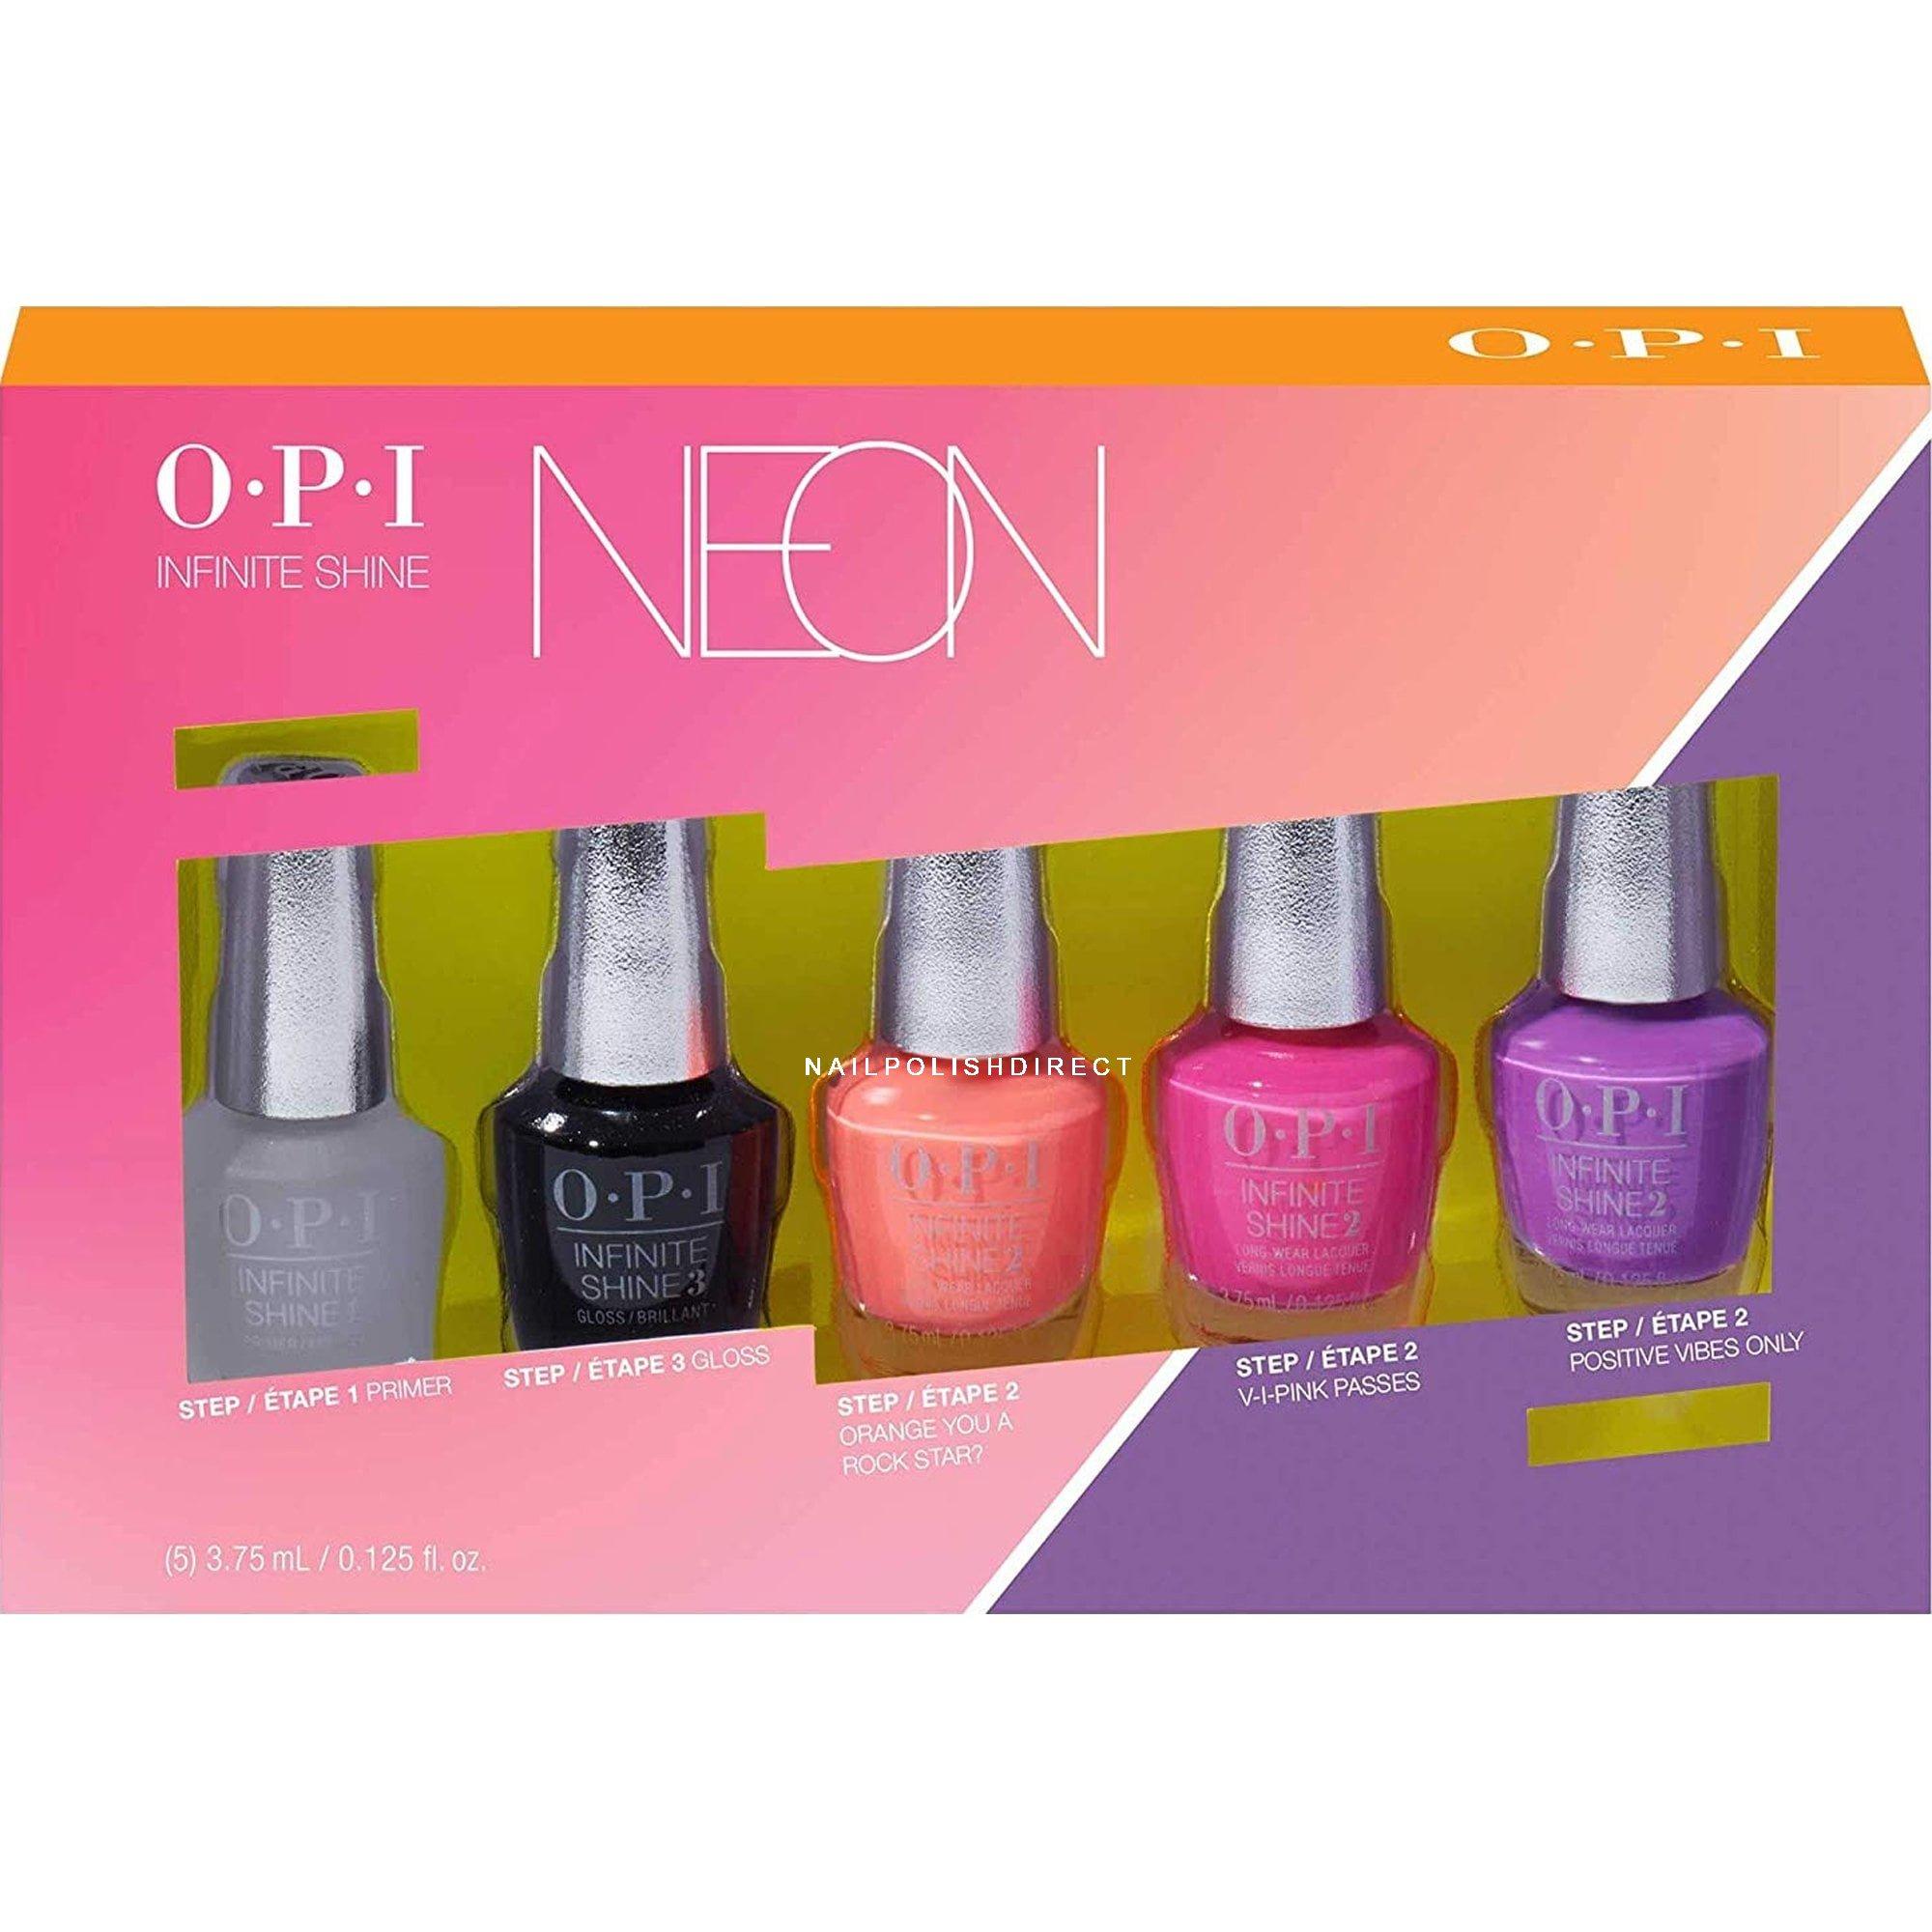 OPI Mini Set - Neon 2019 Nail Polish Collection (5 X 3.75ML) (ISDN1)